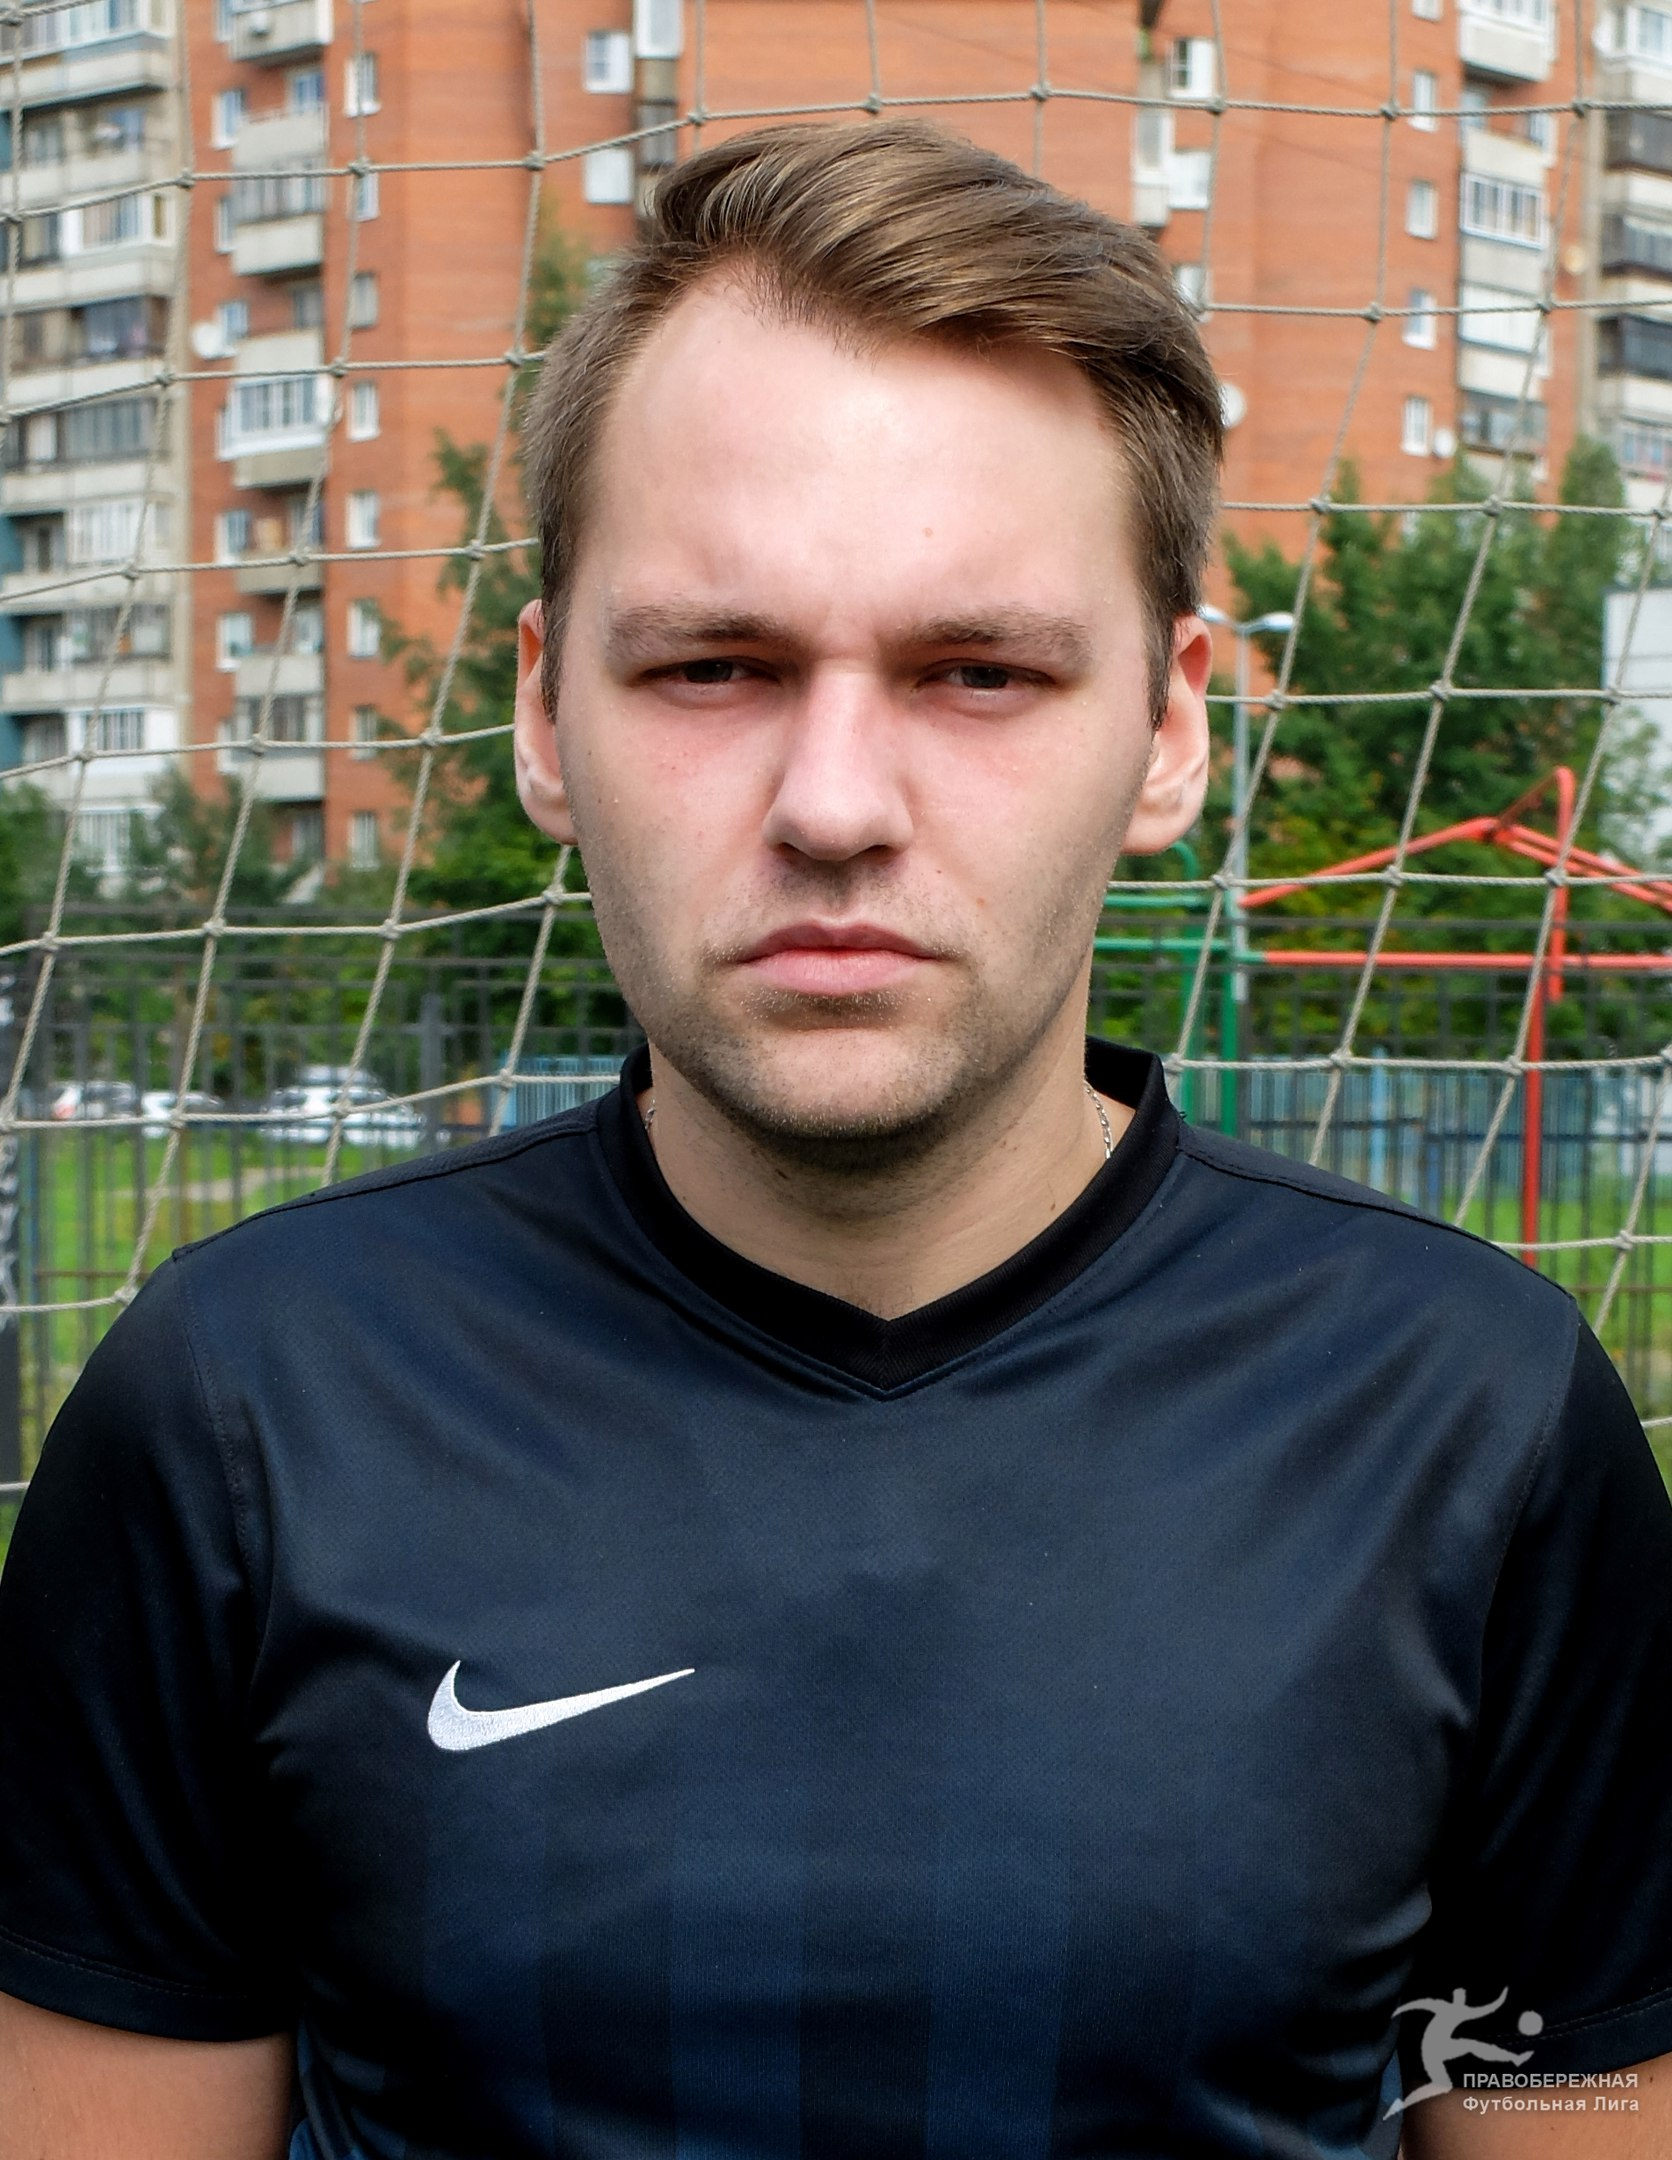 Григорьев Сергей